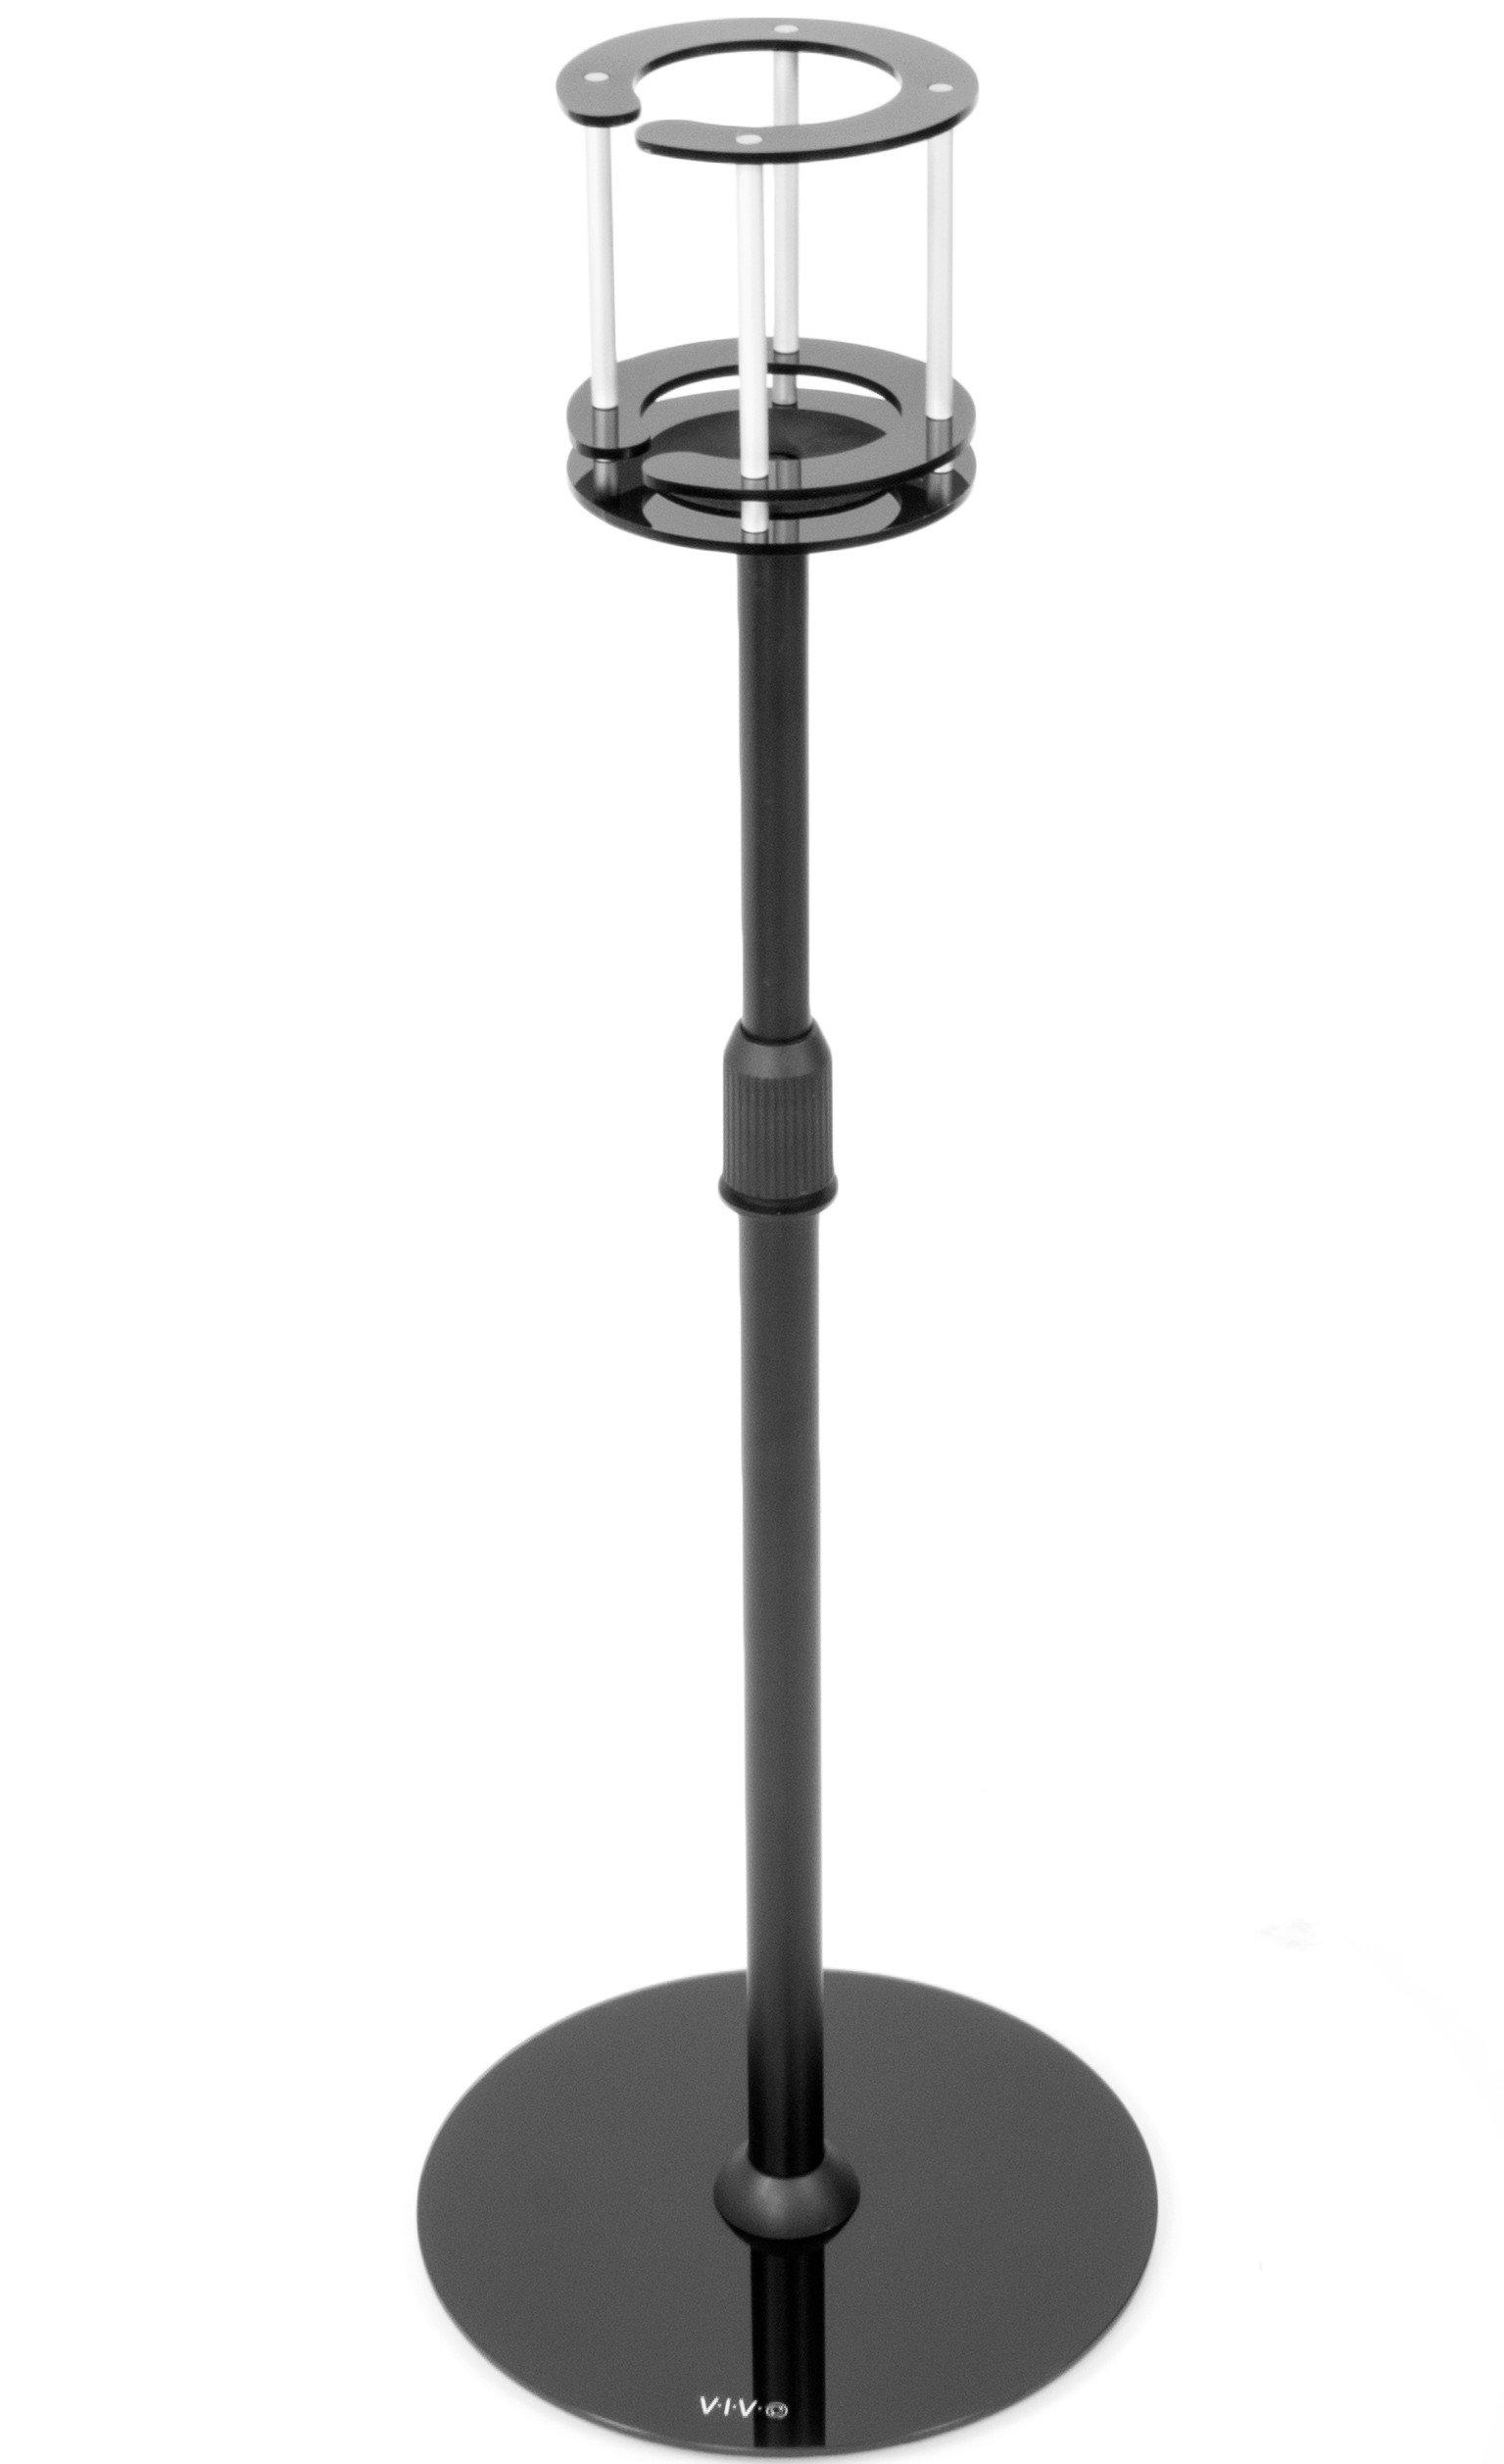 VIVO Black Height Adjustable Steel Floor Stand Holder Mounting Bracket designed for Amazon Echo (1st Gen) Device (STAND-ECHO1)